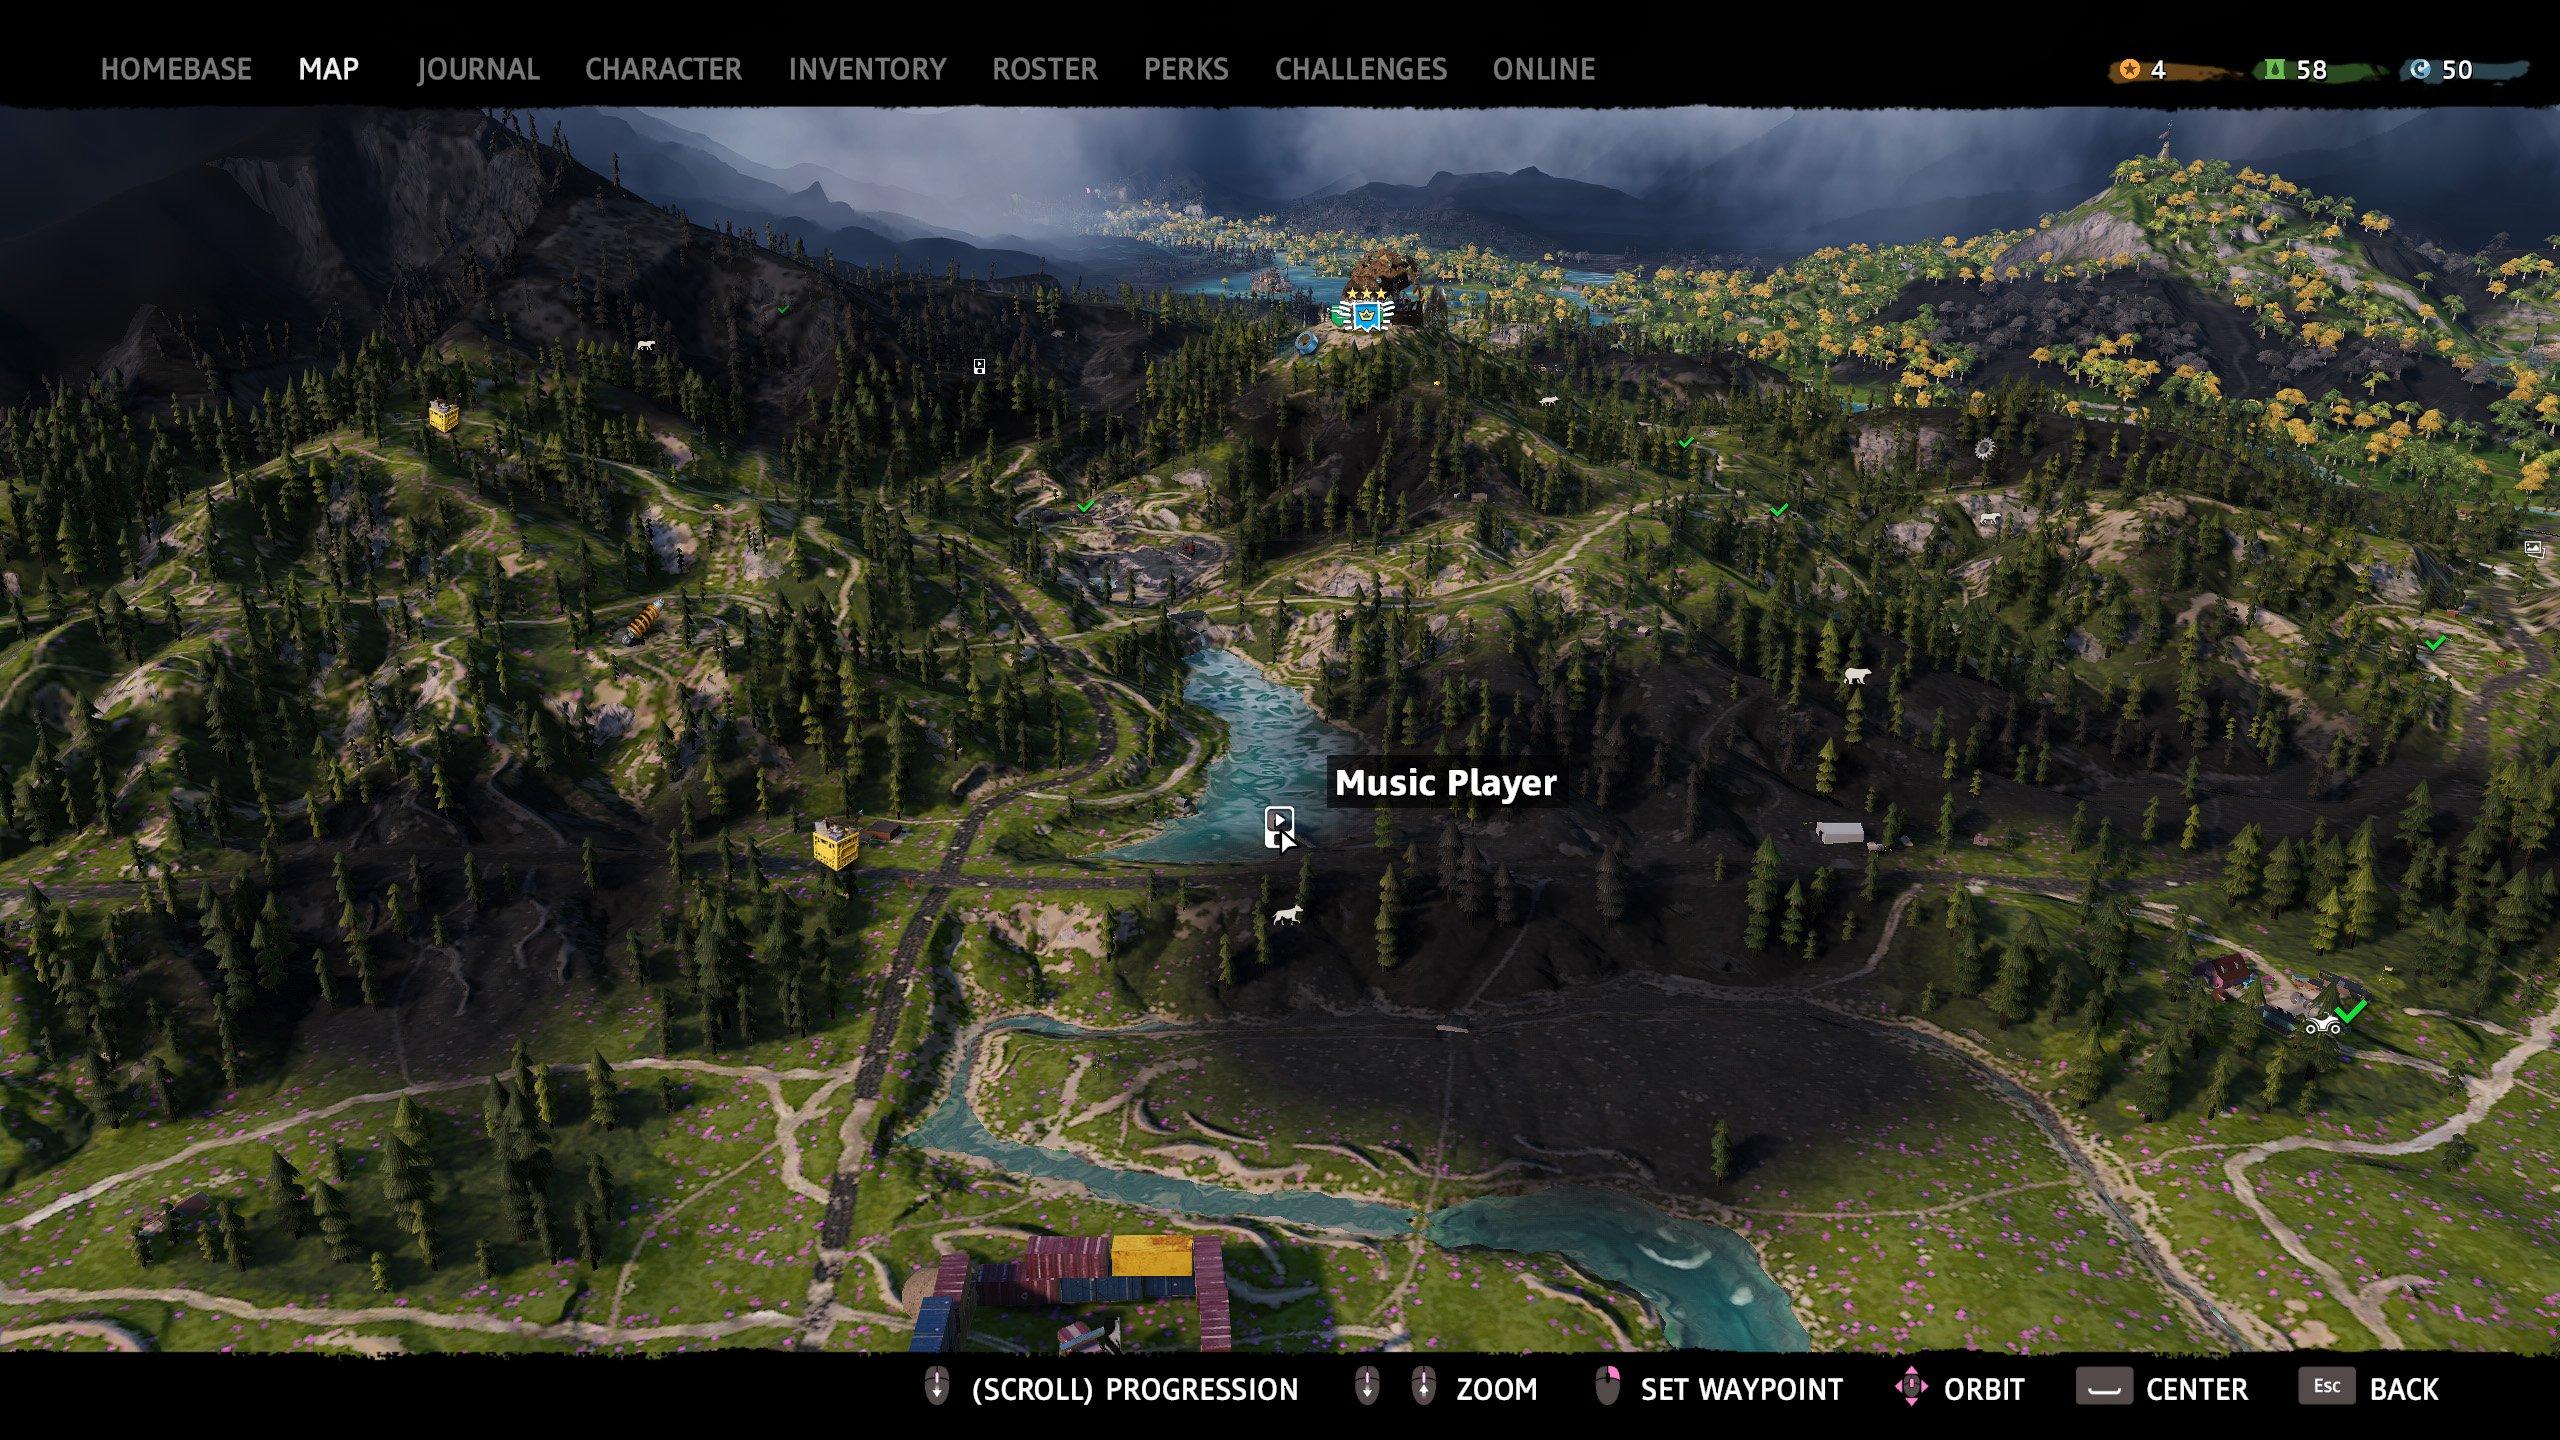 far cry new dawn music player 3 map